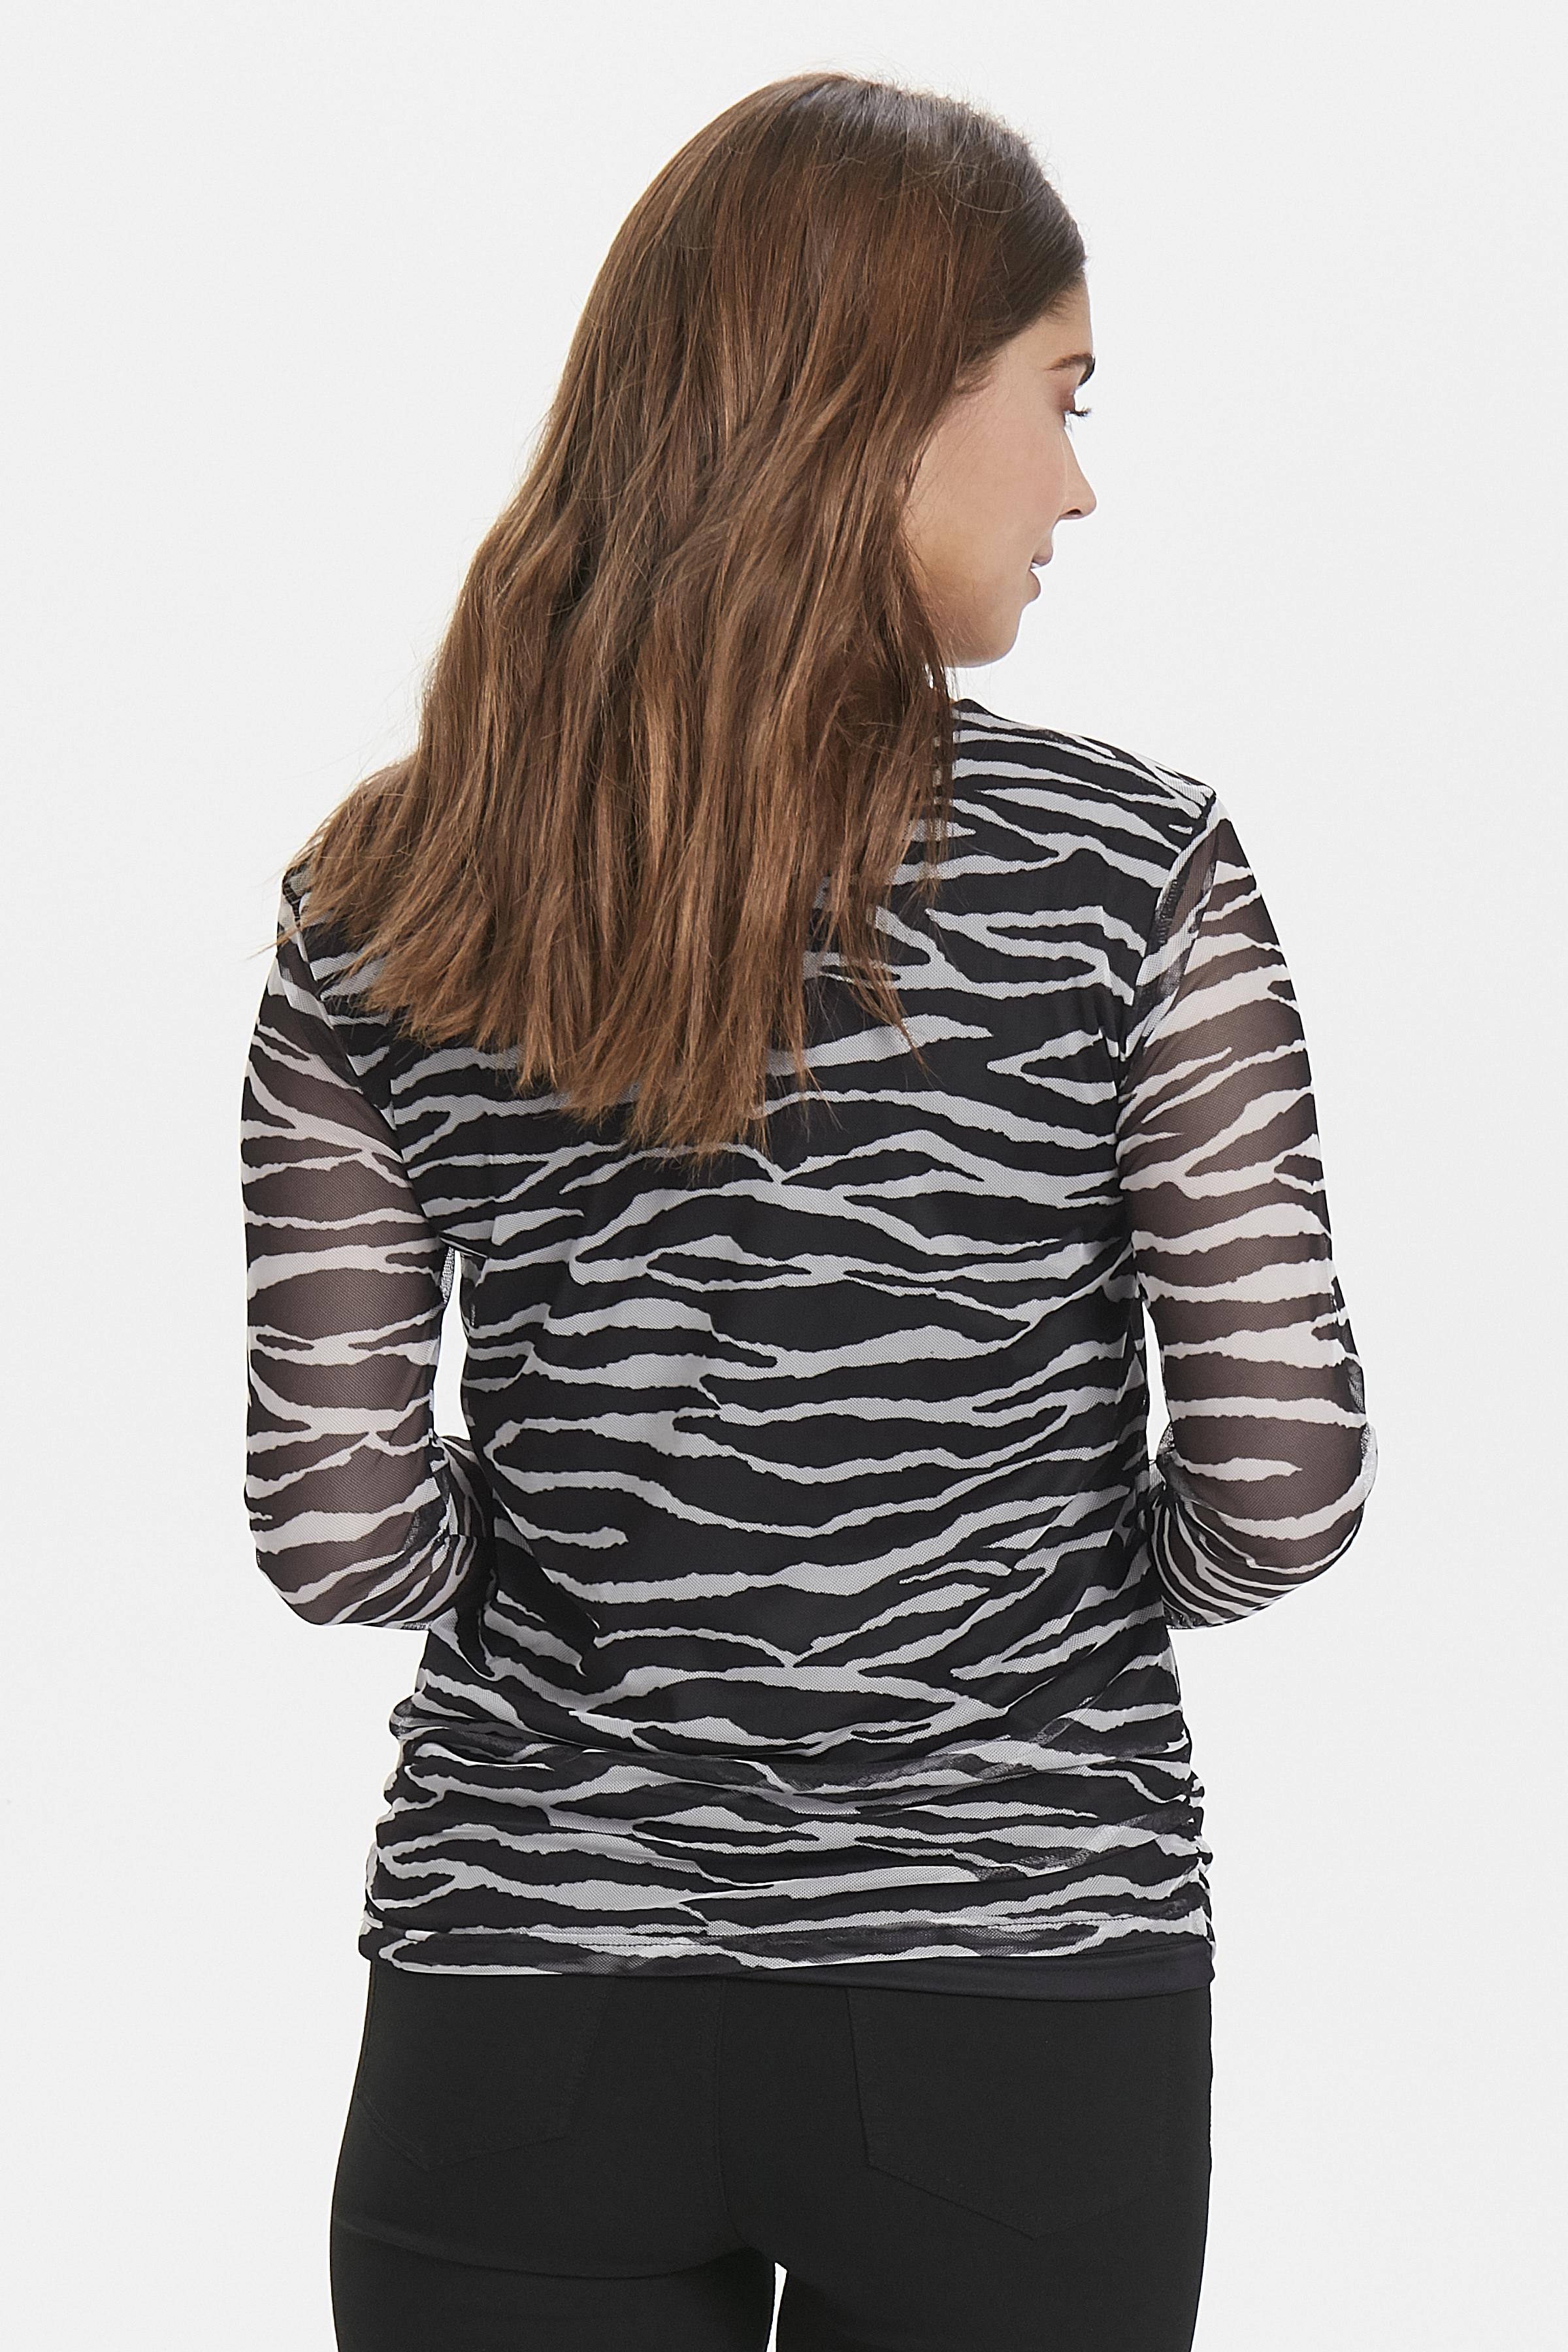 Zebra combi 1 T-shirt from b.young – Buy Zebra combi 1 T-shirt from size XS-XL here